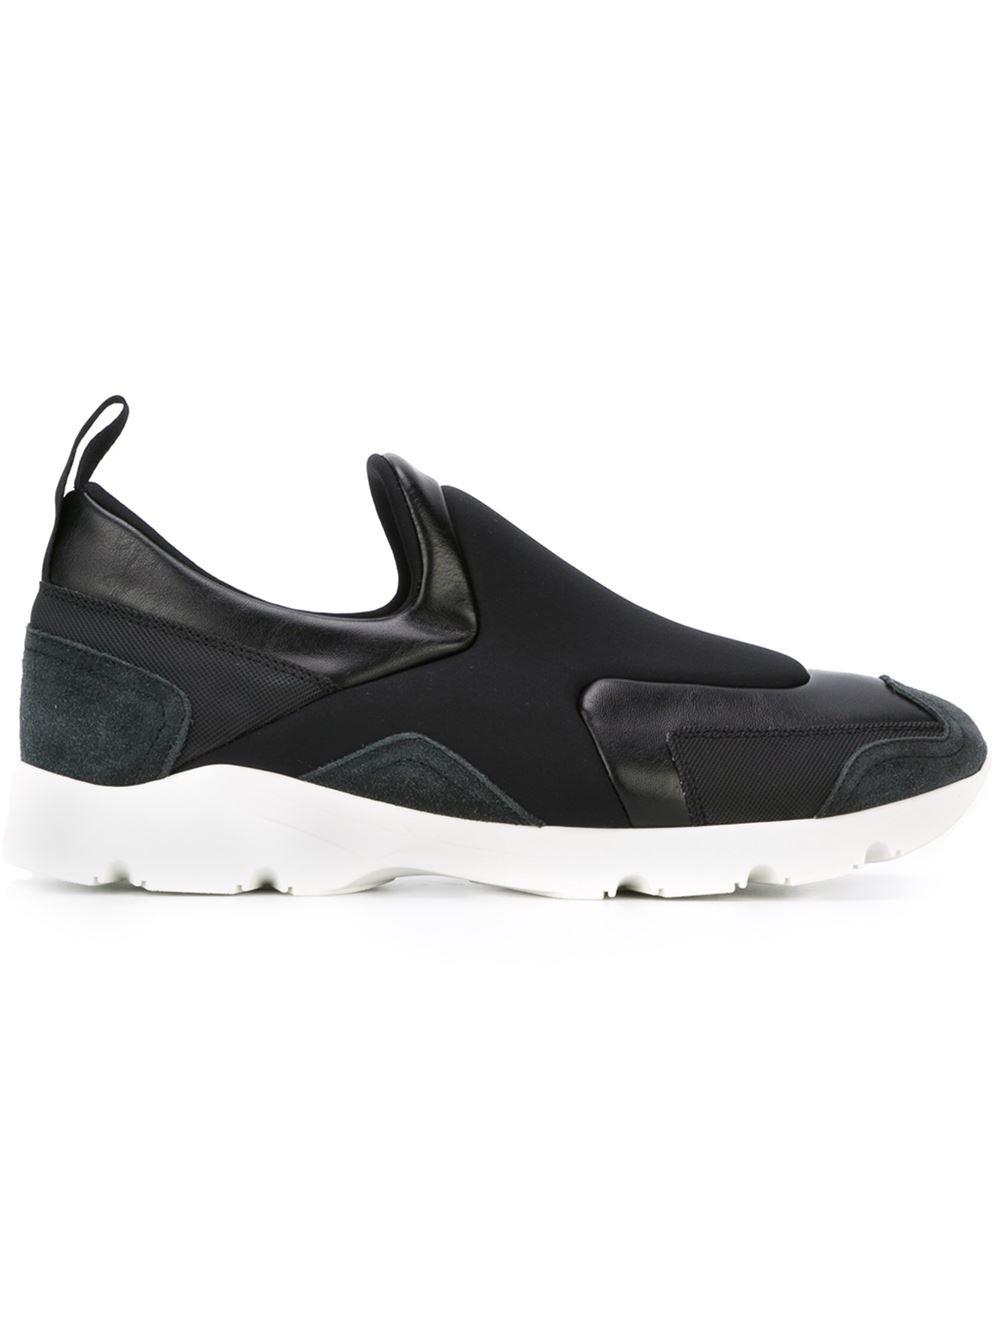 mm6 by maison martin margiela ridged sole paneled slip on sneakers in black for men lyst. Black Bedroom Furniture Sets. Home Design Ideas